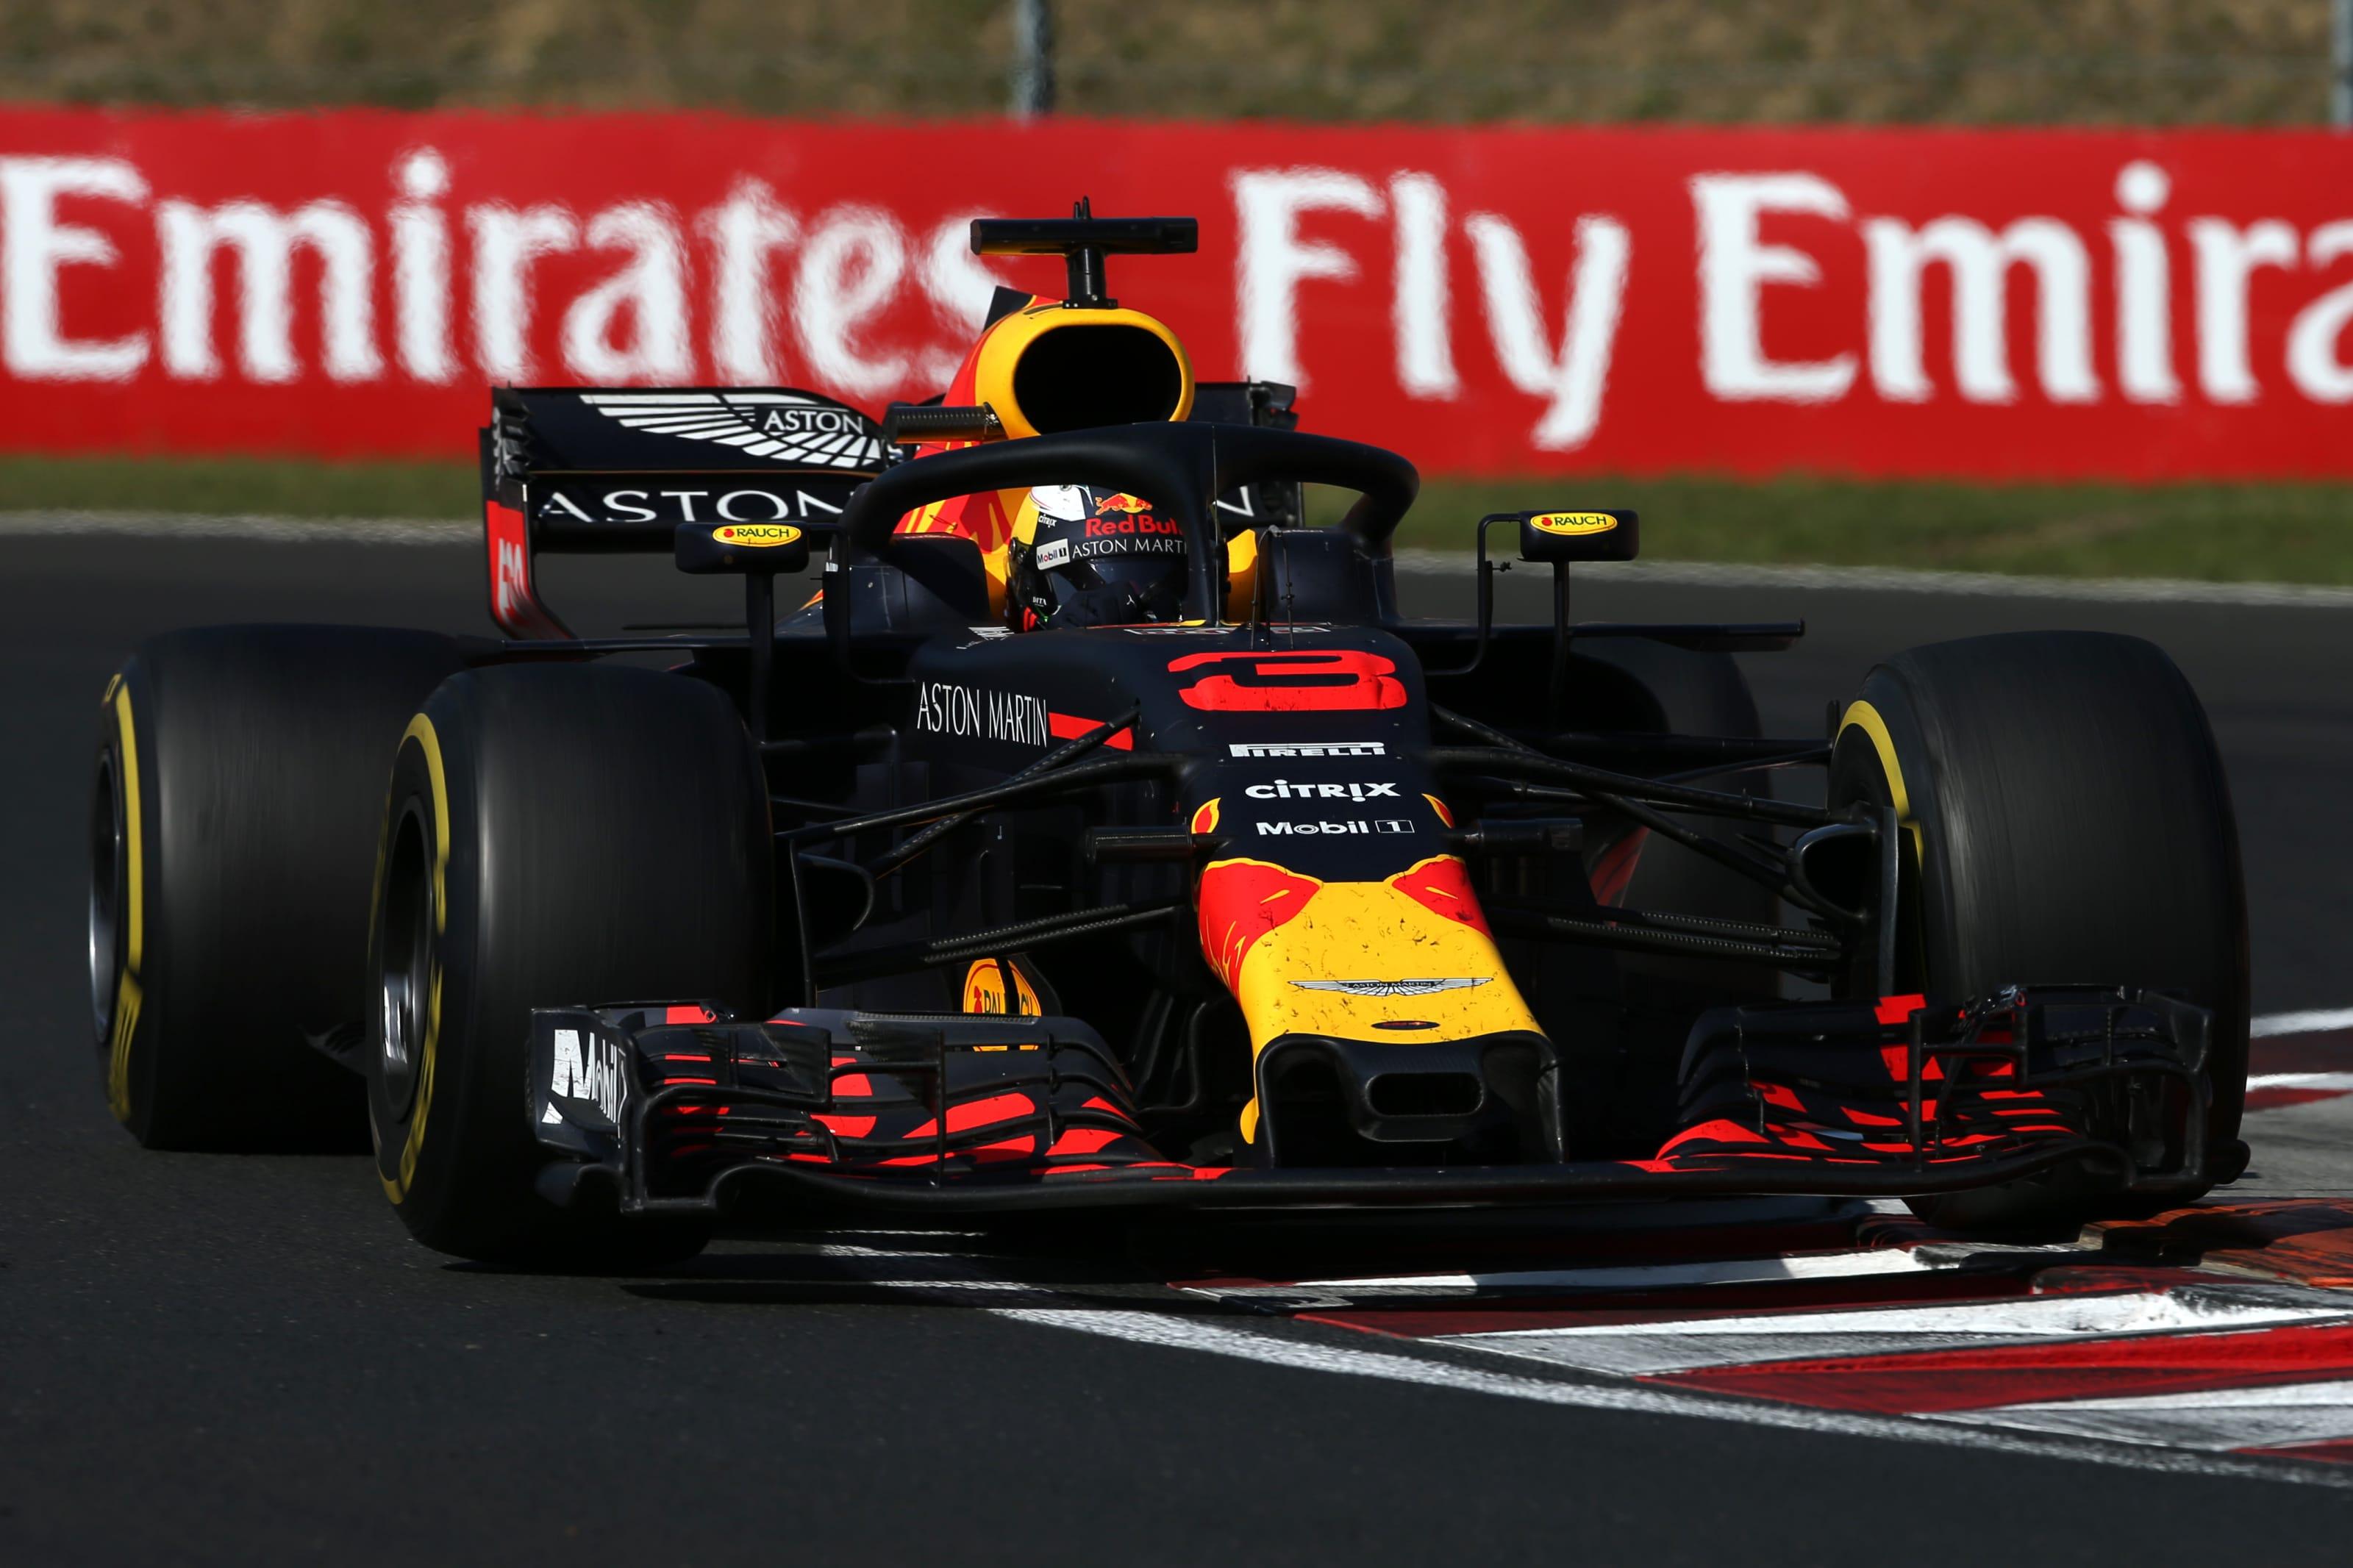 Formula 1 Top 5 Replacement Candidates For Daniel Ricciardo At Red Bull Racing